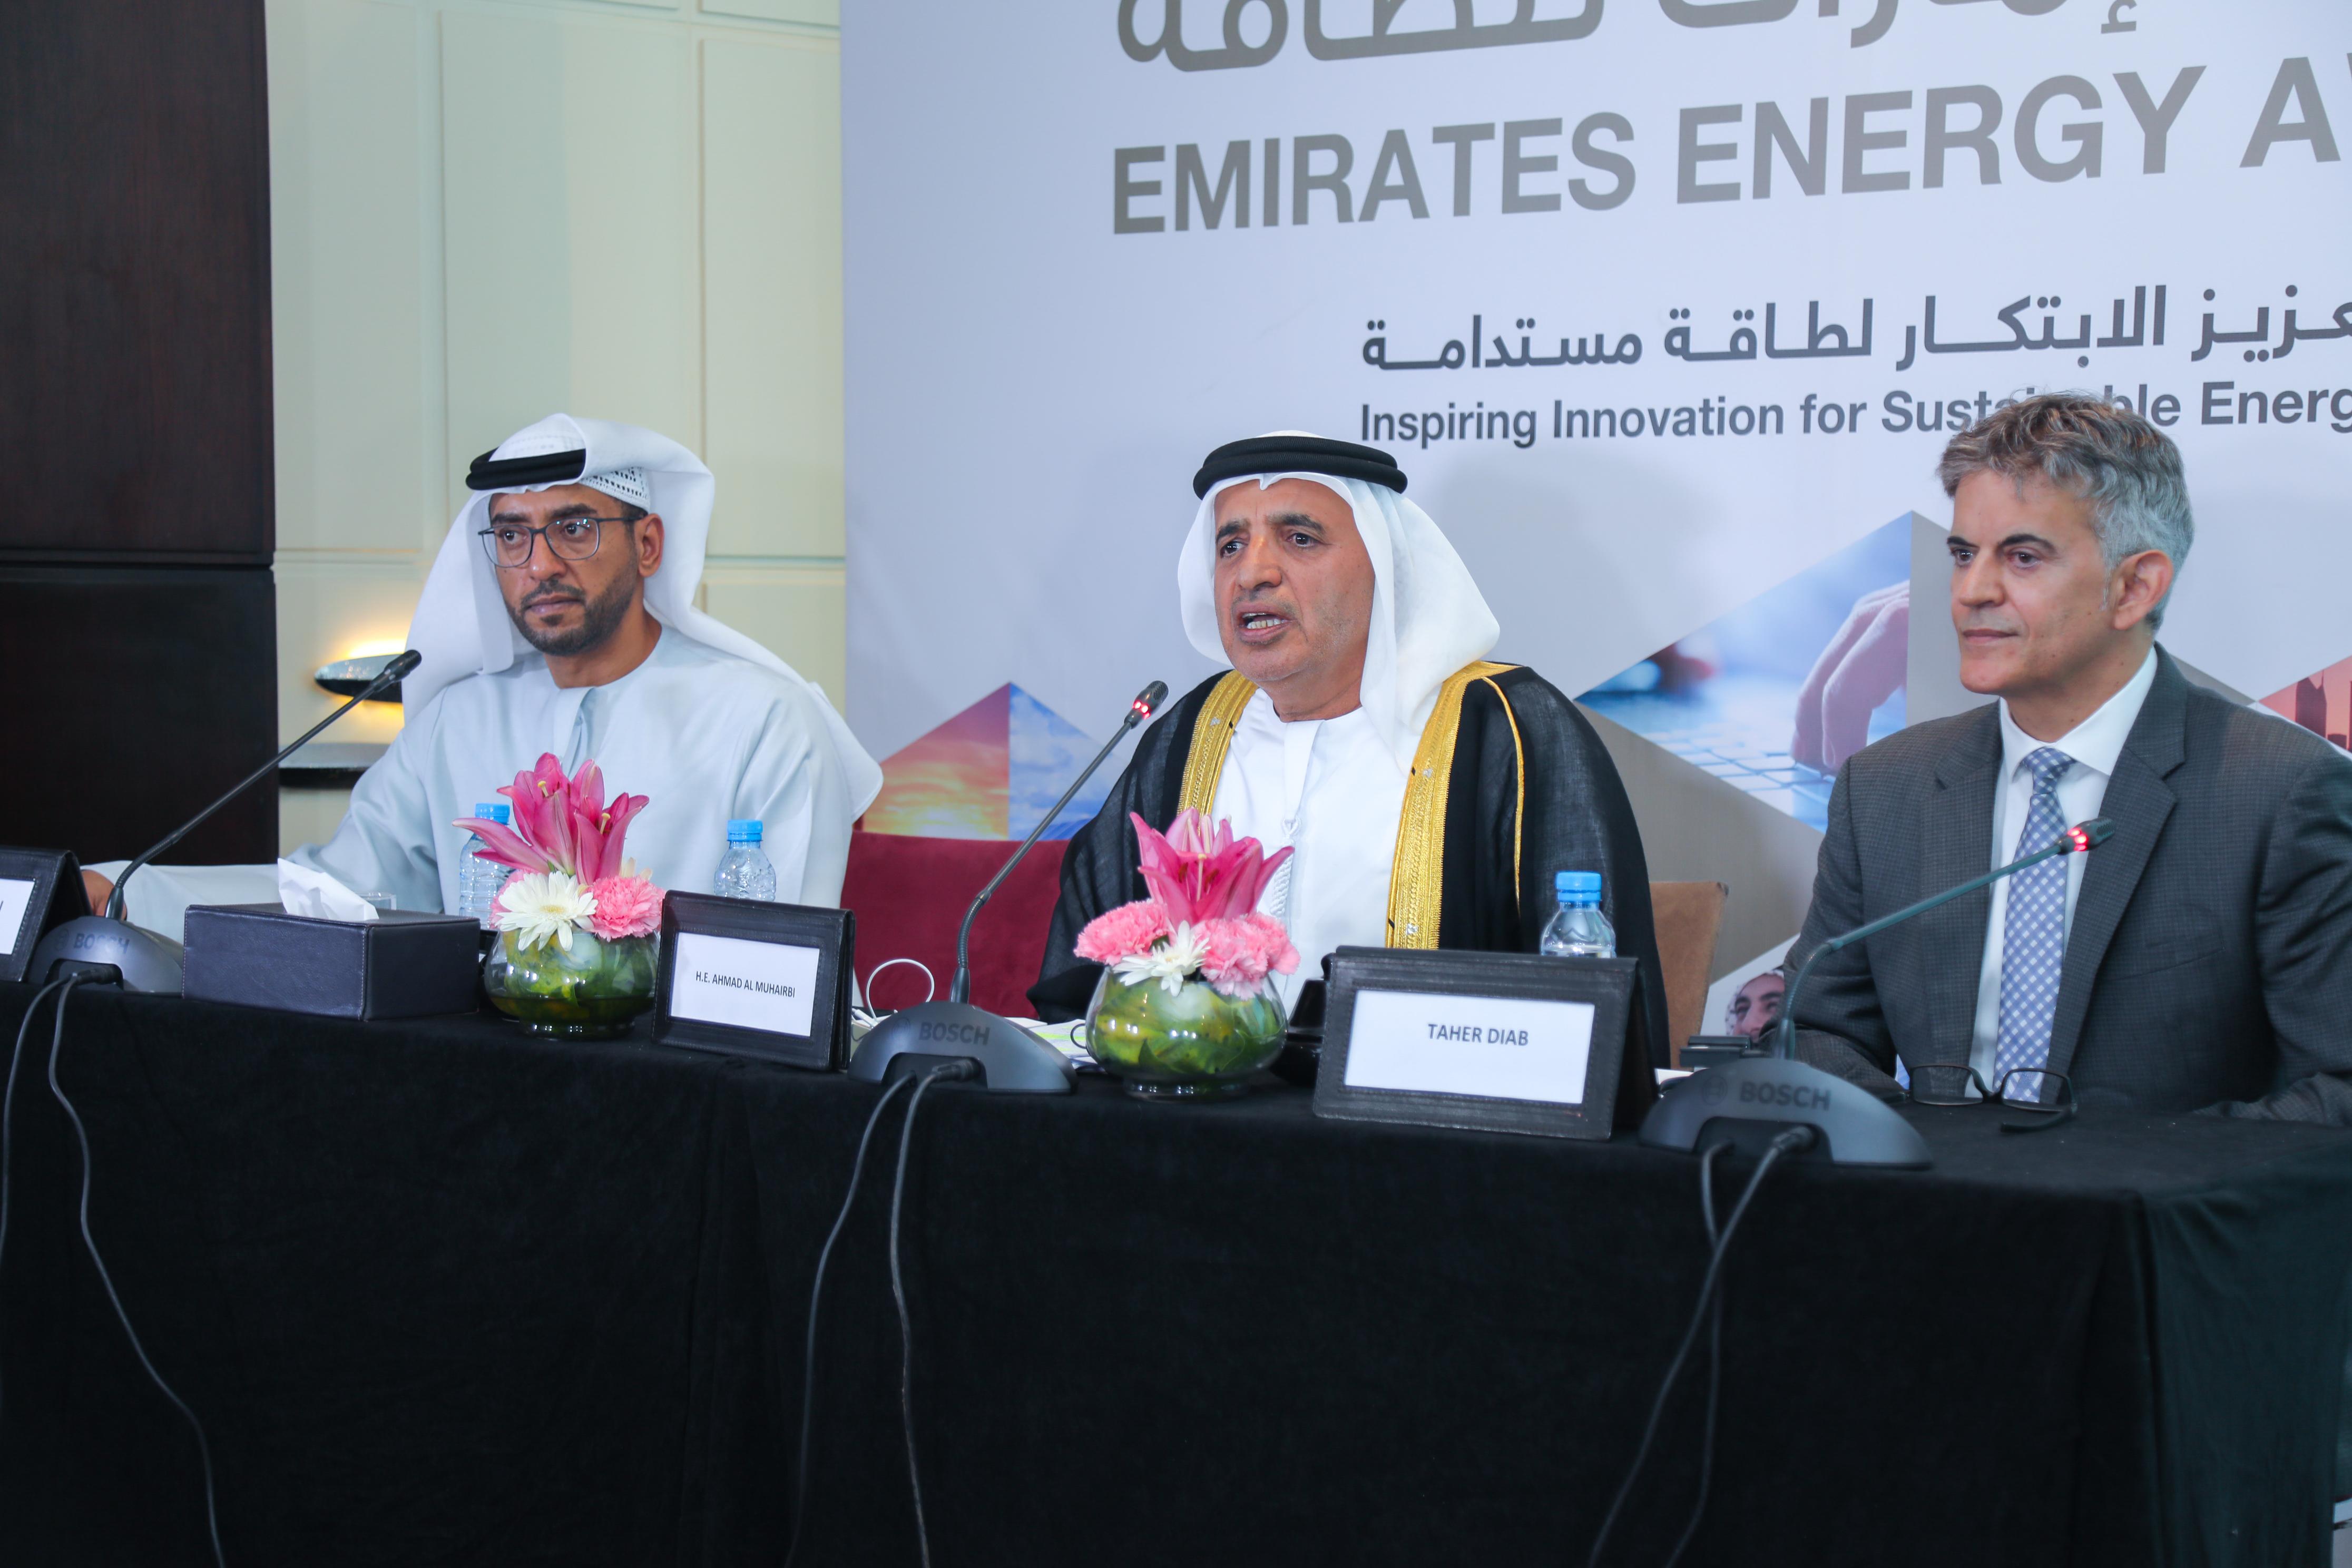 Emirates Energy